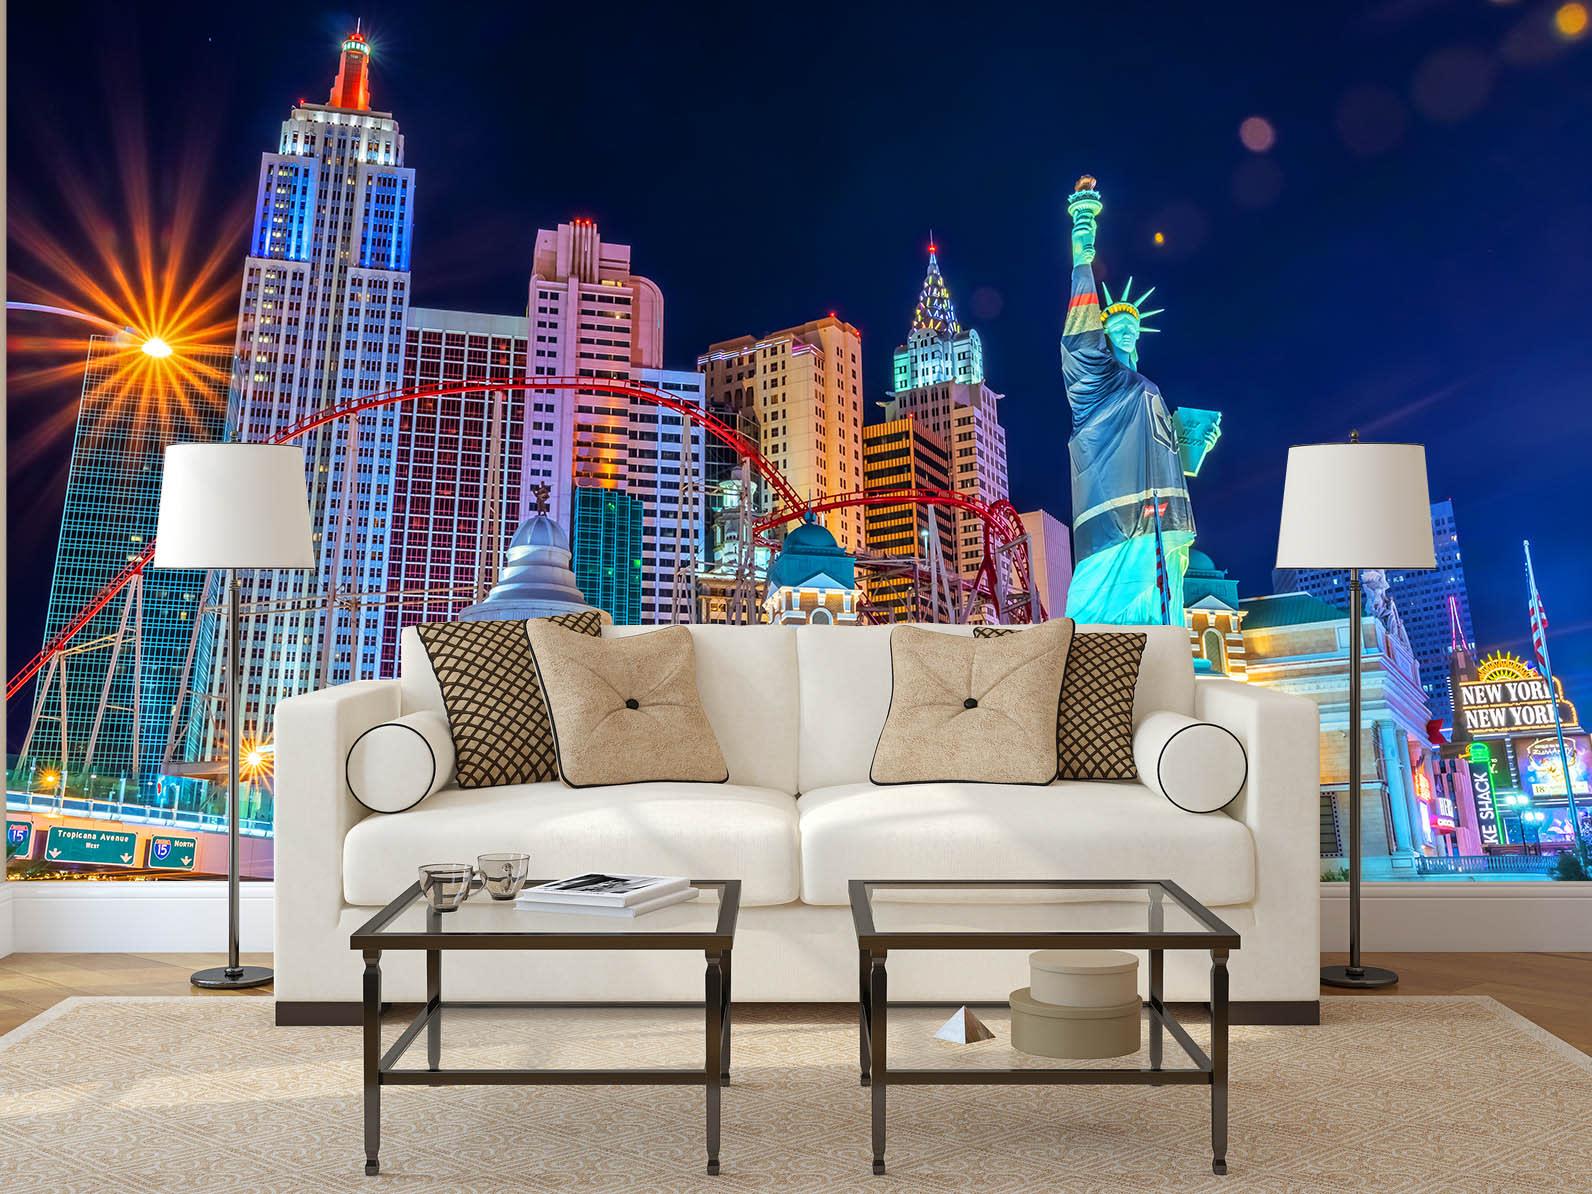 New york new york hotel and casino hpe0un